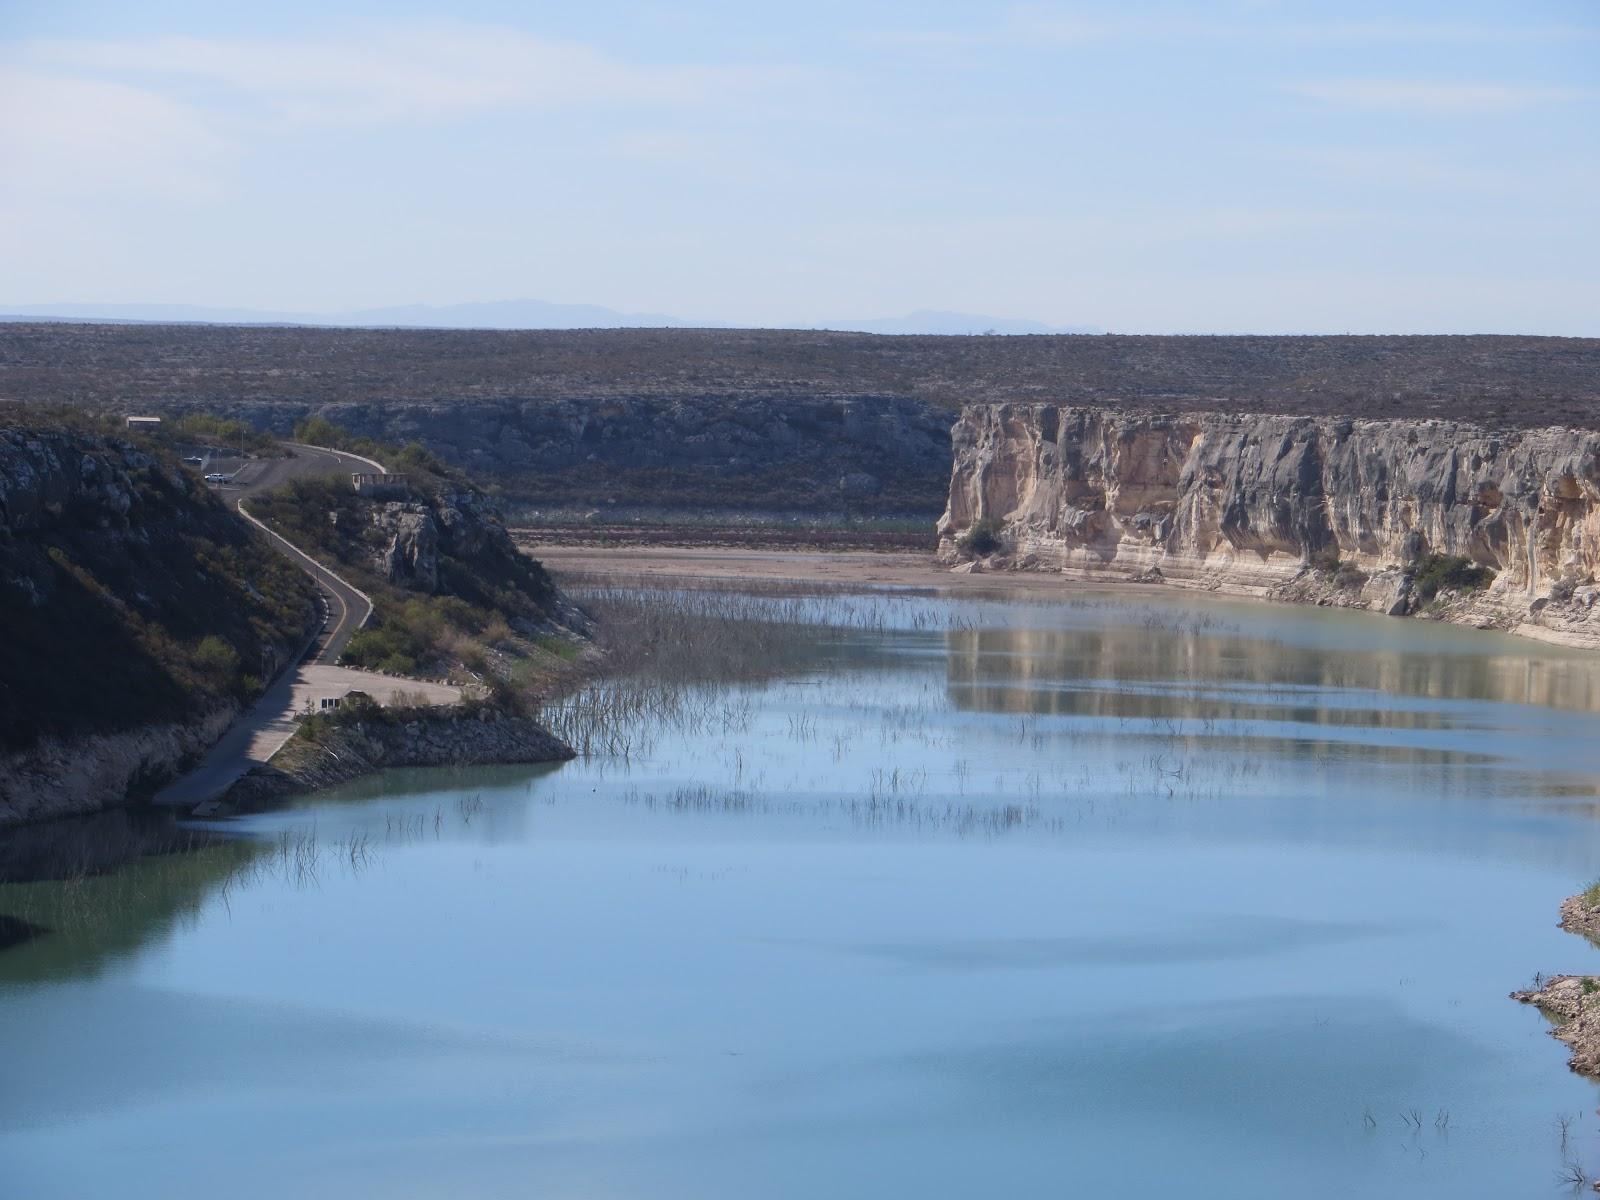 Marpeg: Pecos River, TX